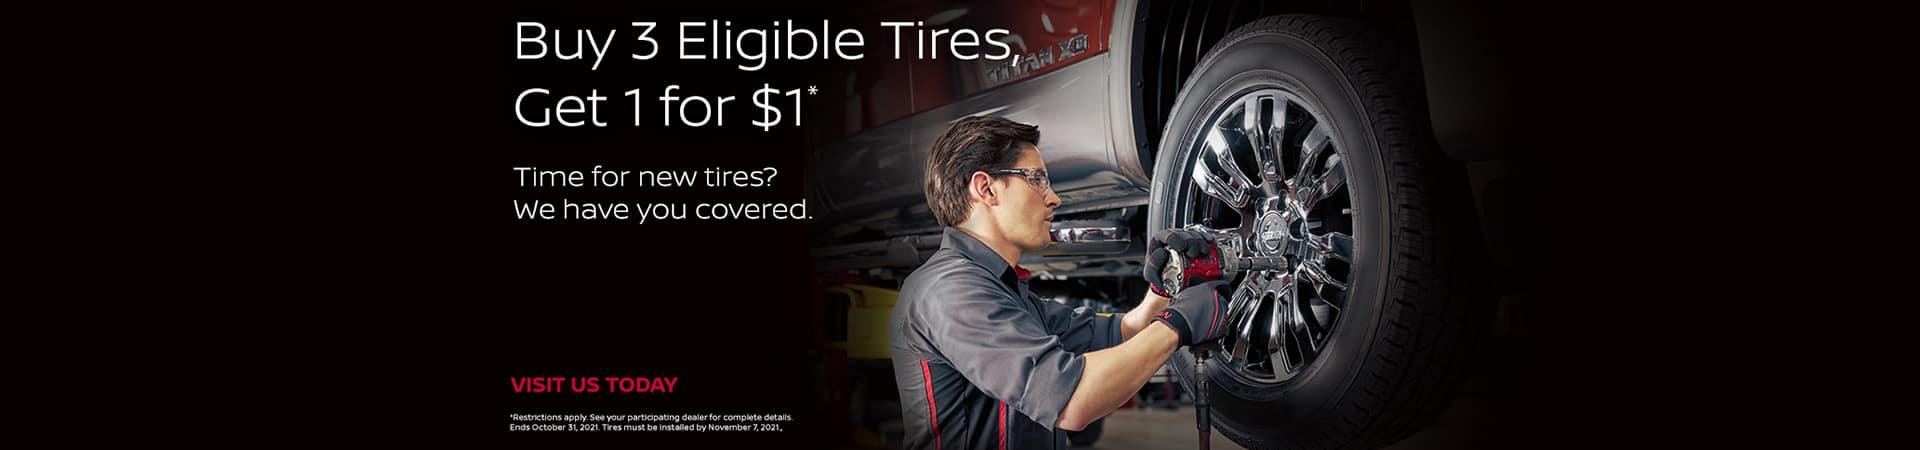 August September October Nissan Tires Special